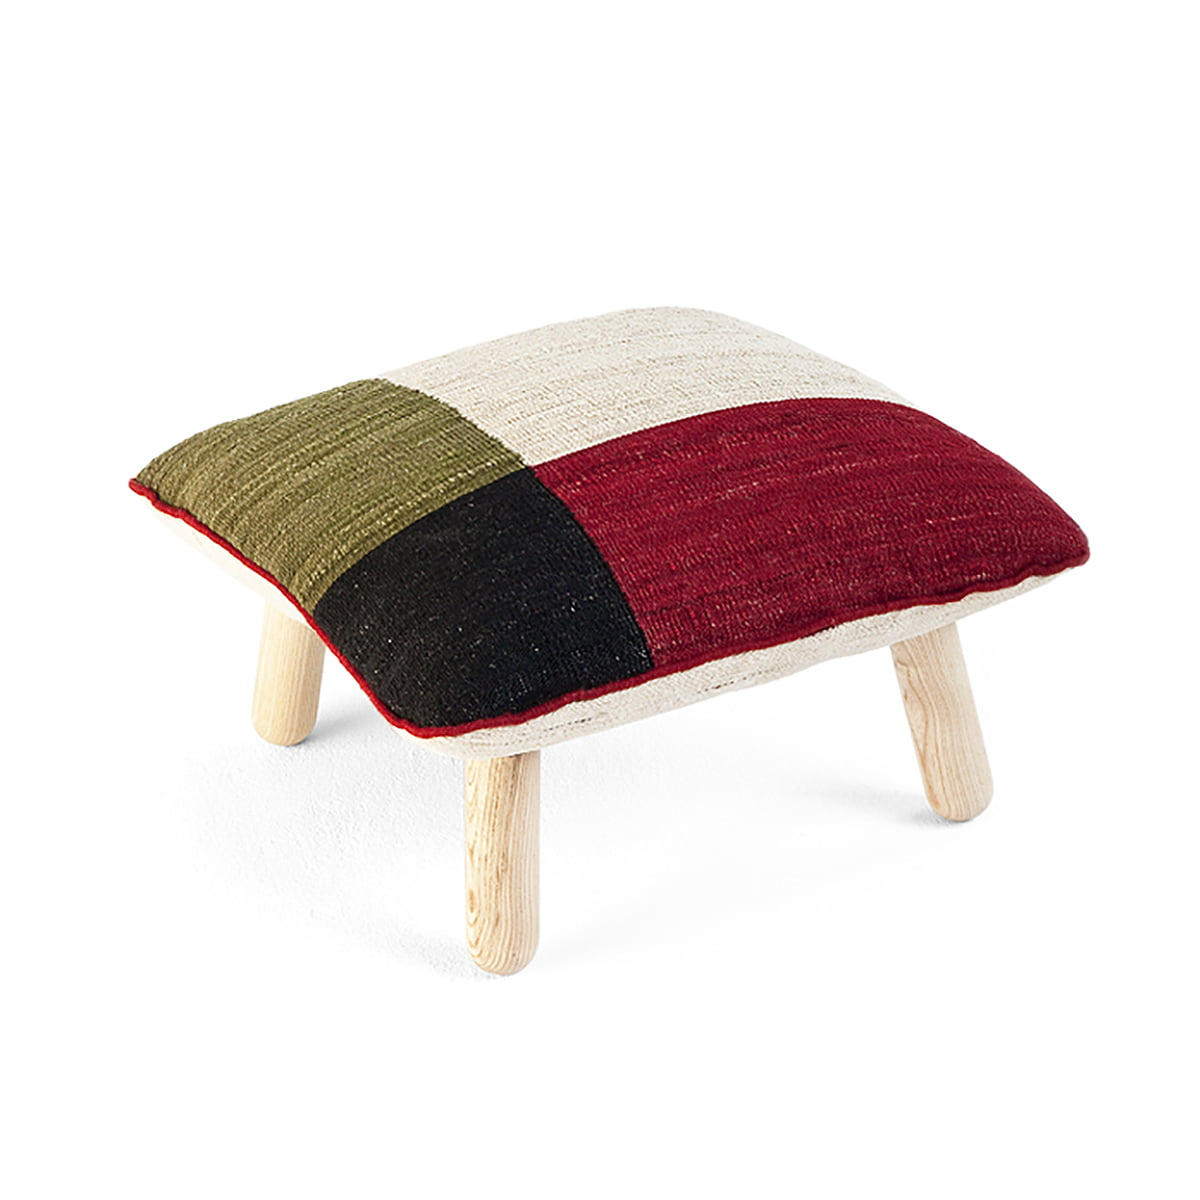 m lange pouf von nanimarquina im shop kaufen. Black Bedroom Furniture Sets. Home Design Ideas